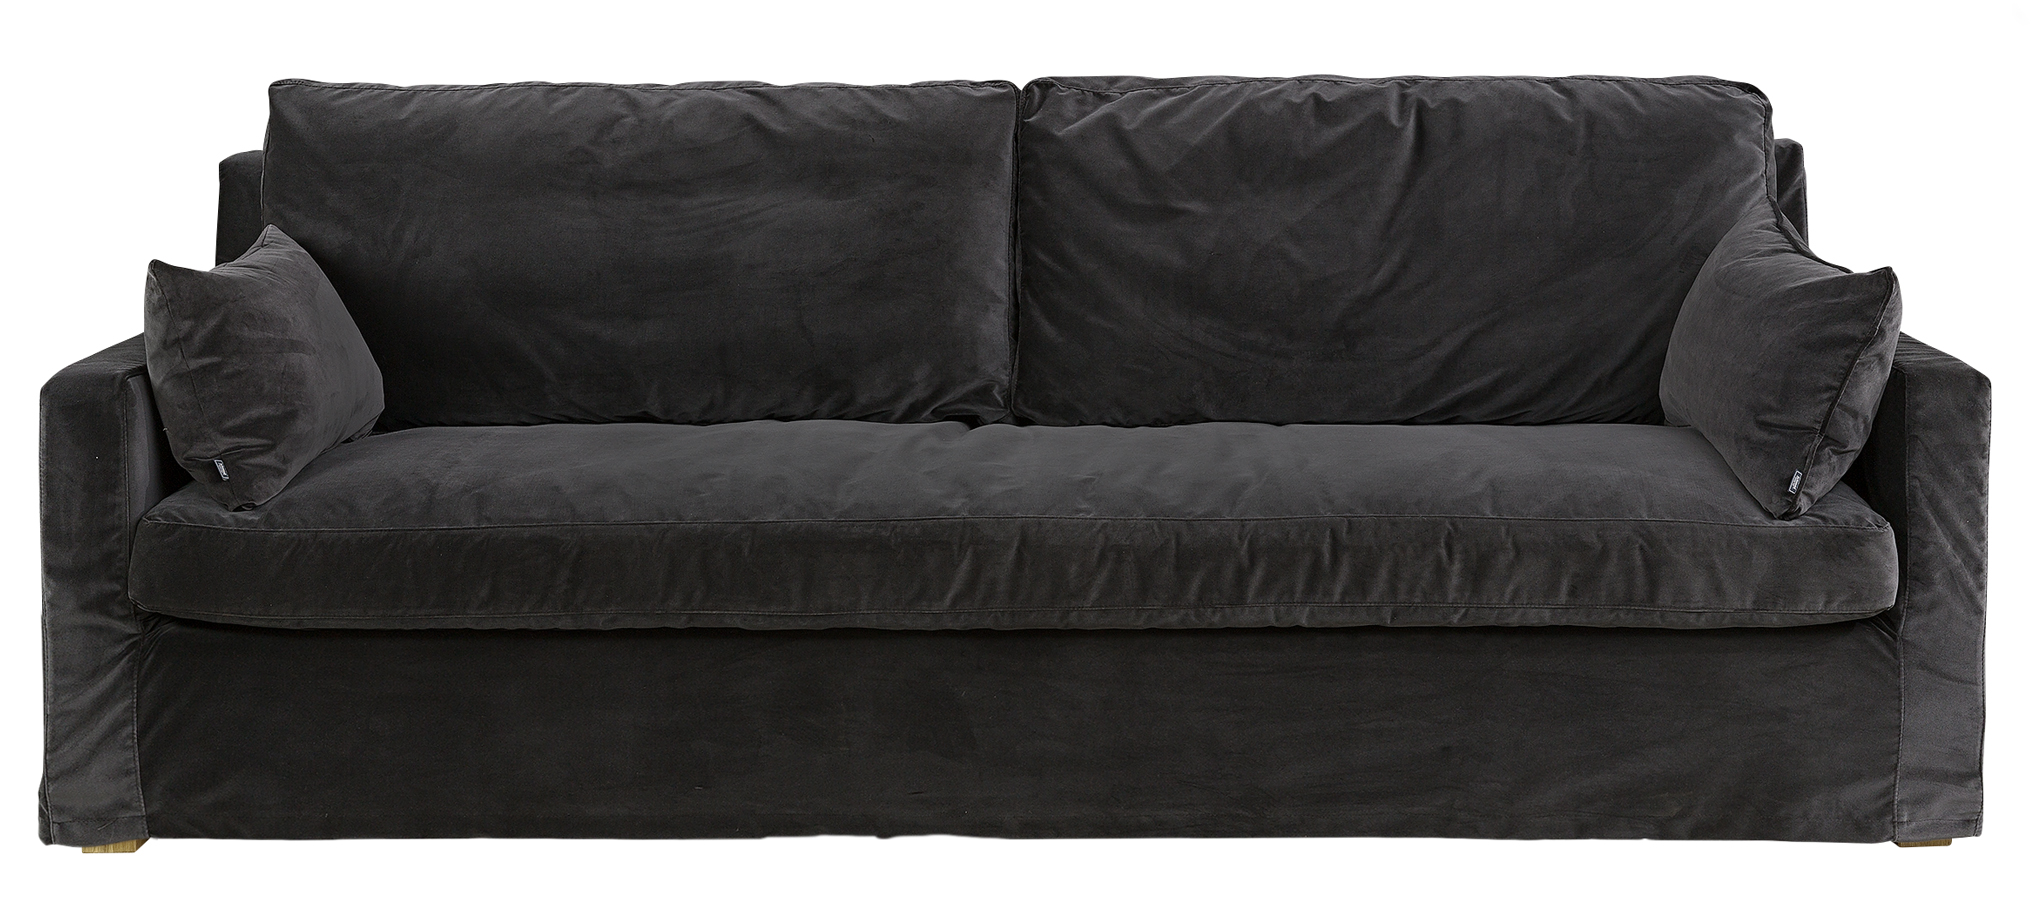 Milford soffa - Azimut anthracite